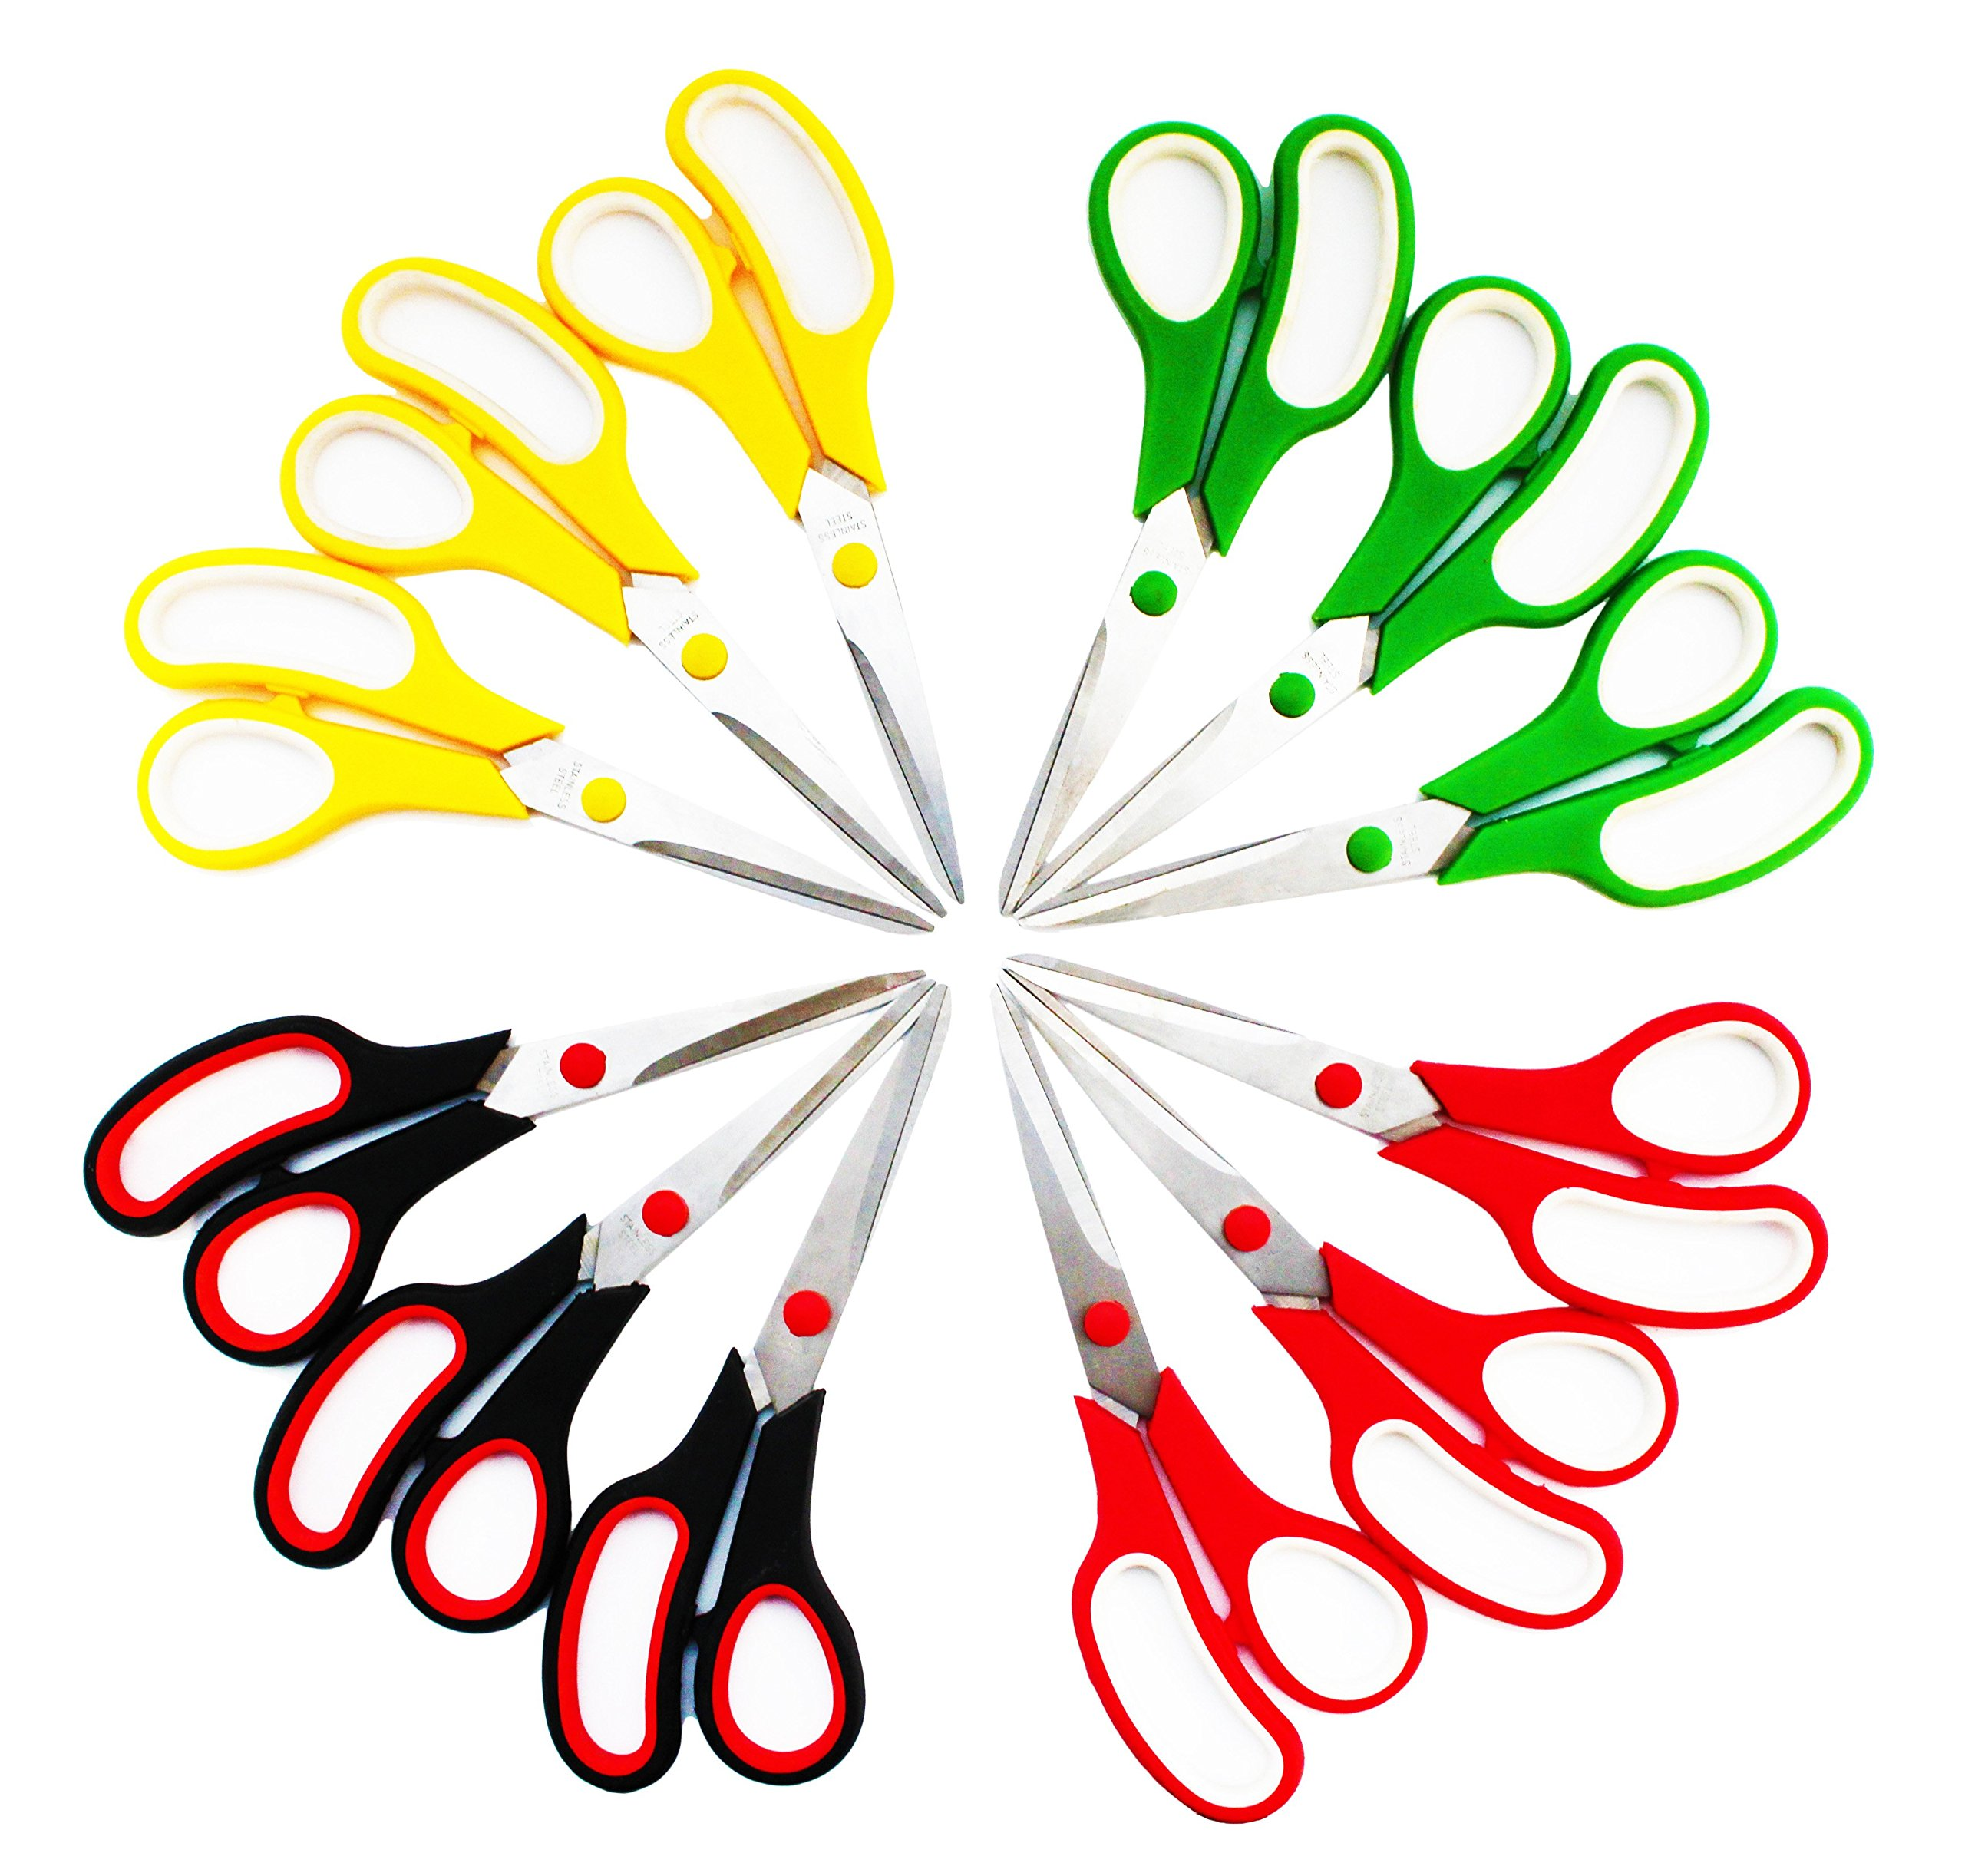 SKKSTATIONERY 8.5 Inch Scissors, Stainless Steel Sharp Blade, Comfort-Grip Handles, Pack of 12